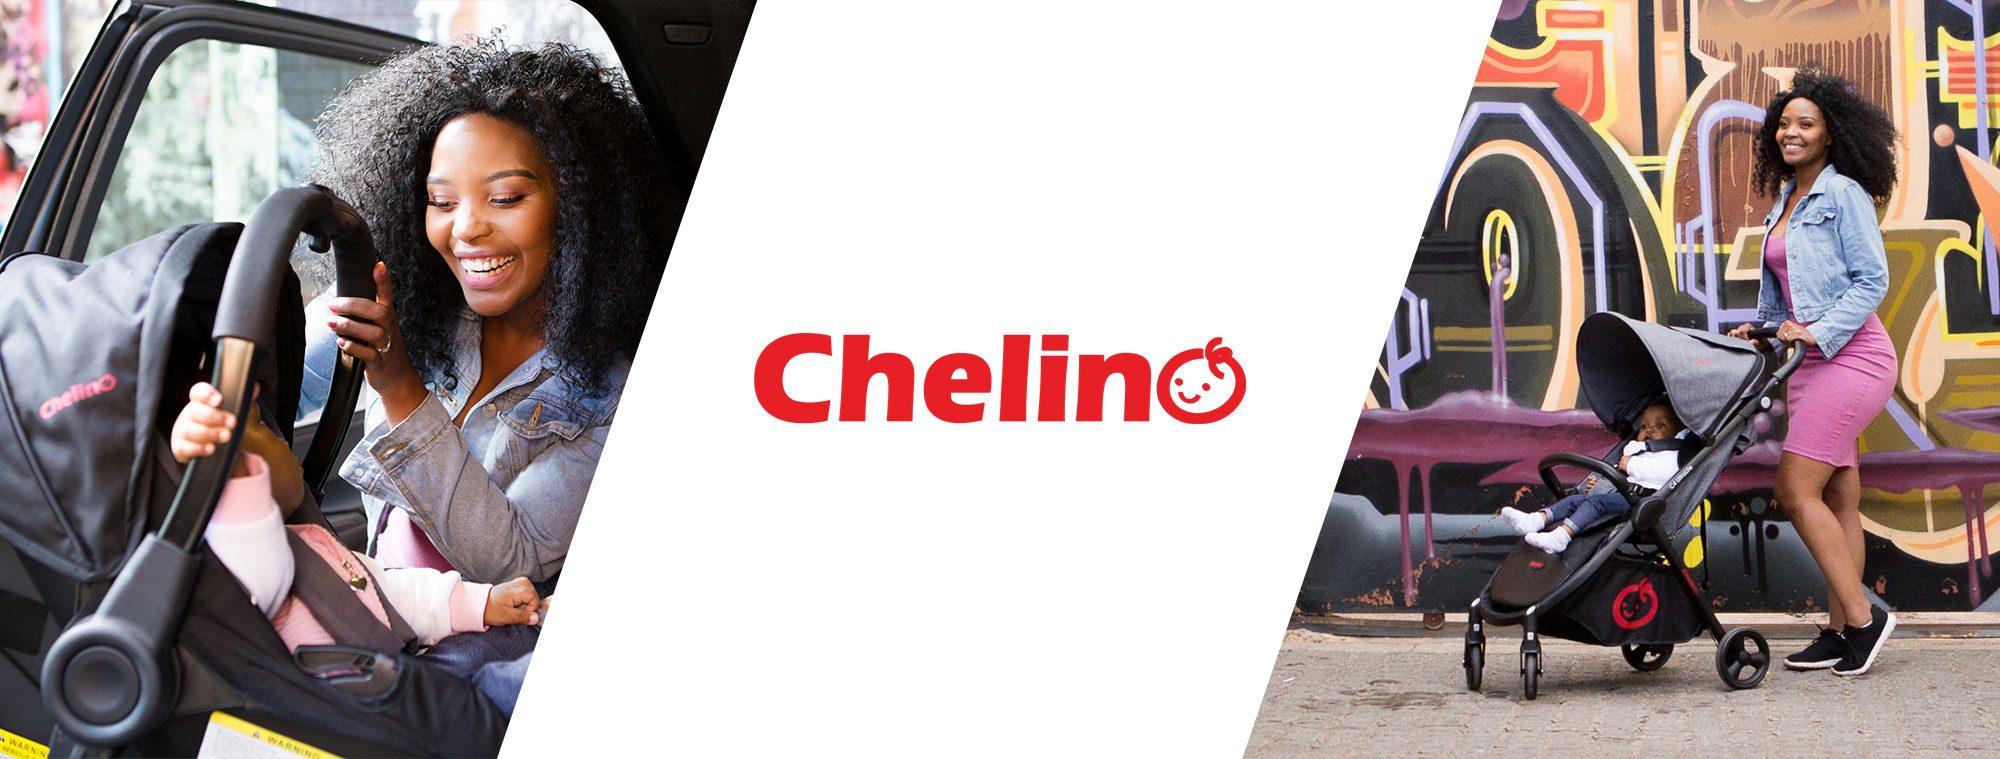 Sliding-Banner-1-chalino6